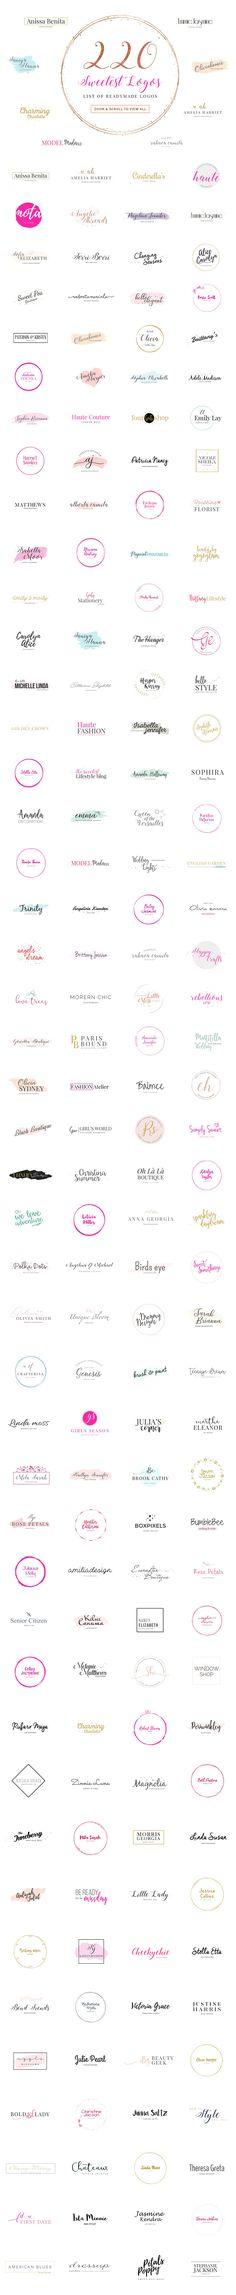 Girlboss Premade Branding Logo Pack by SNIPESCIENTIST on @creativemarket